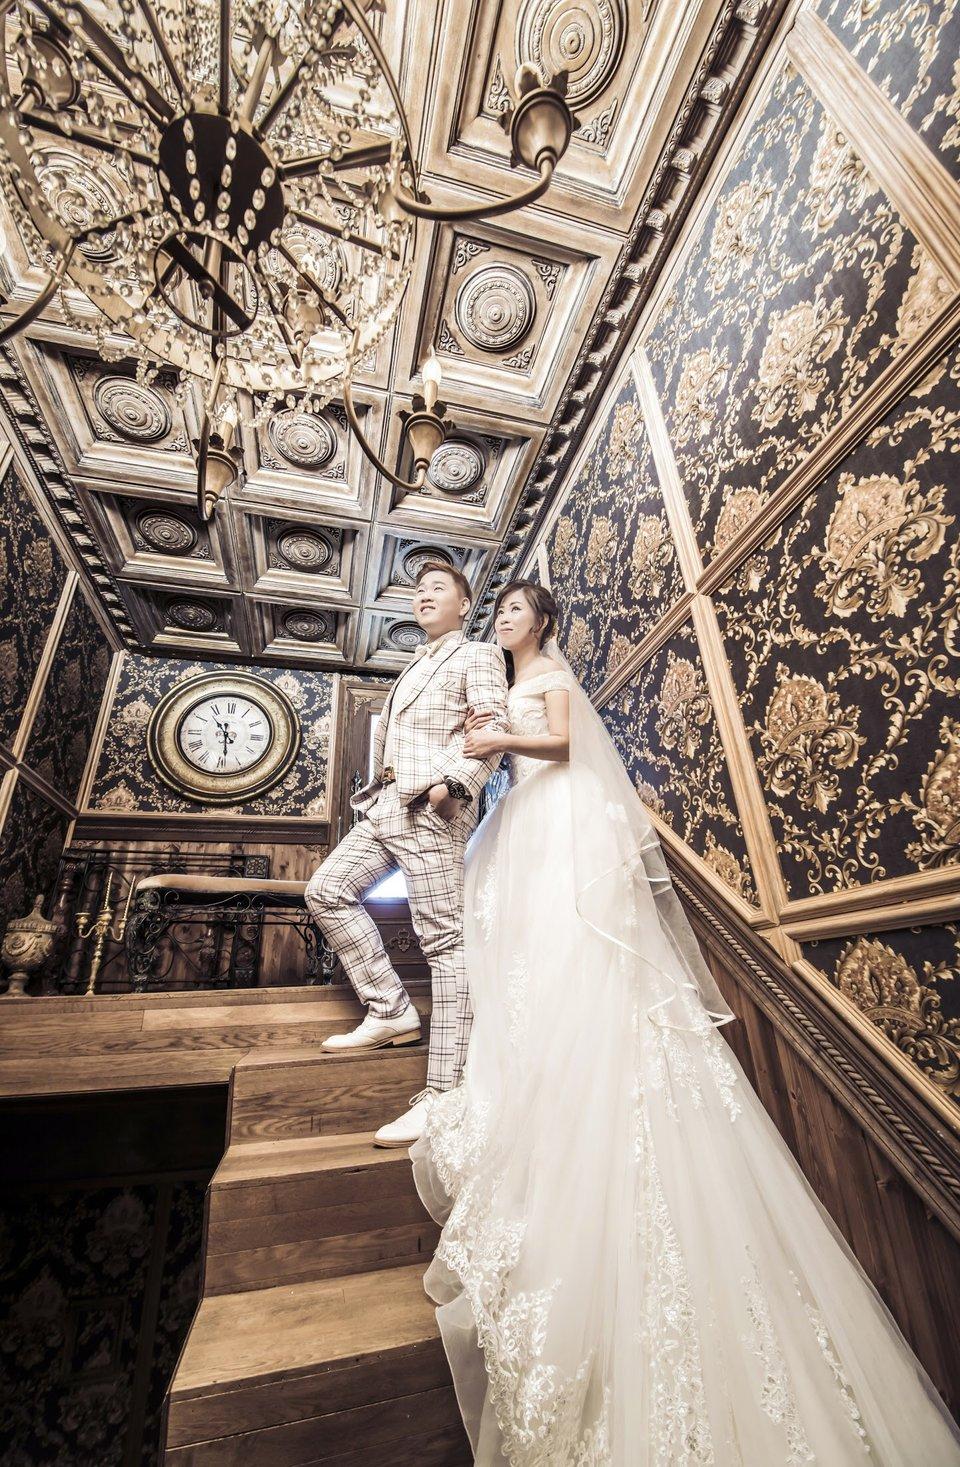 WH-為您好事韓風婚紗,推!高CP值、好服務~為您好事